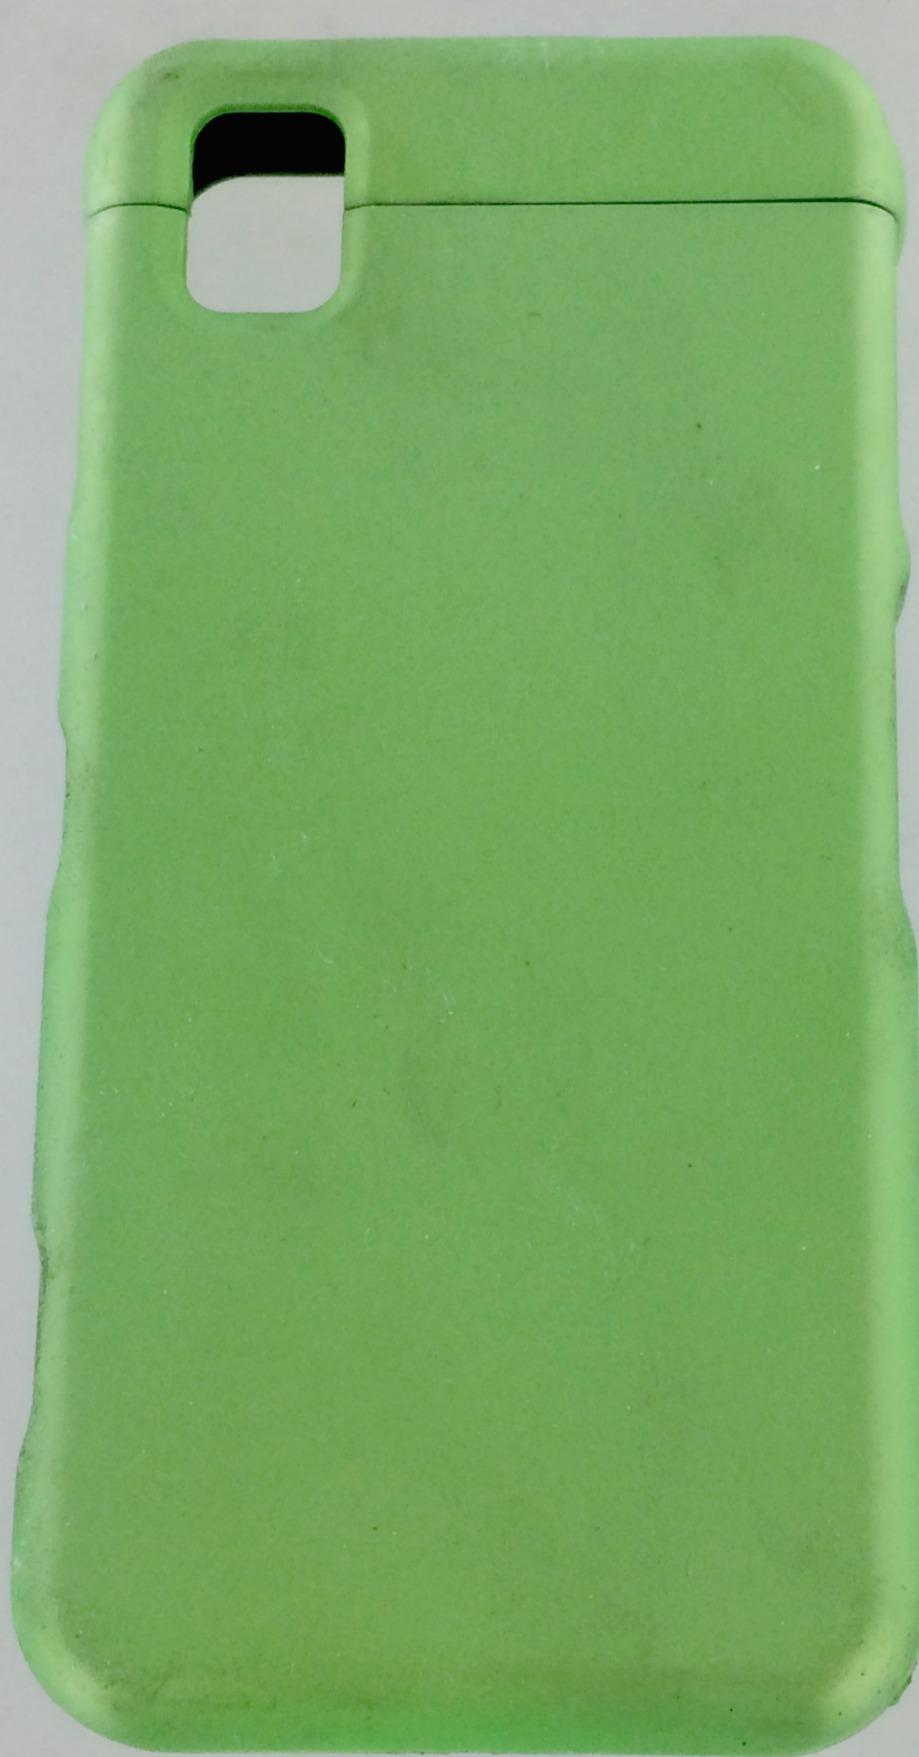 Sprint Snap-On Case for Samsung Instinct M800 - Green